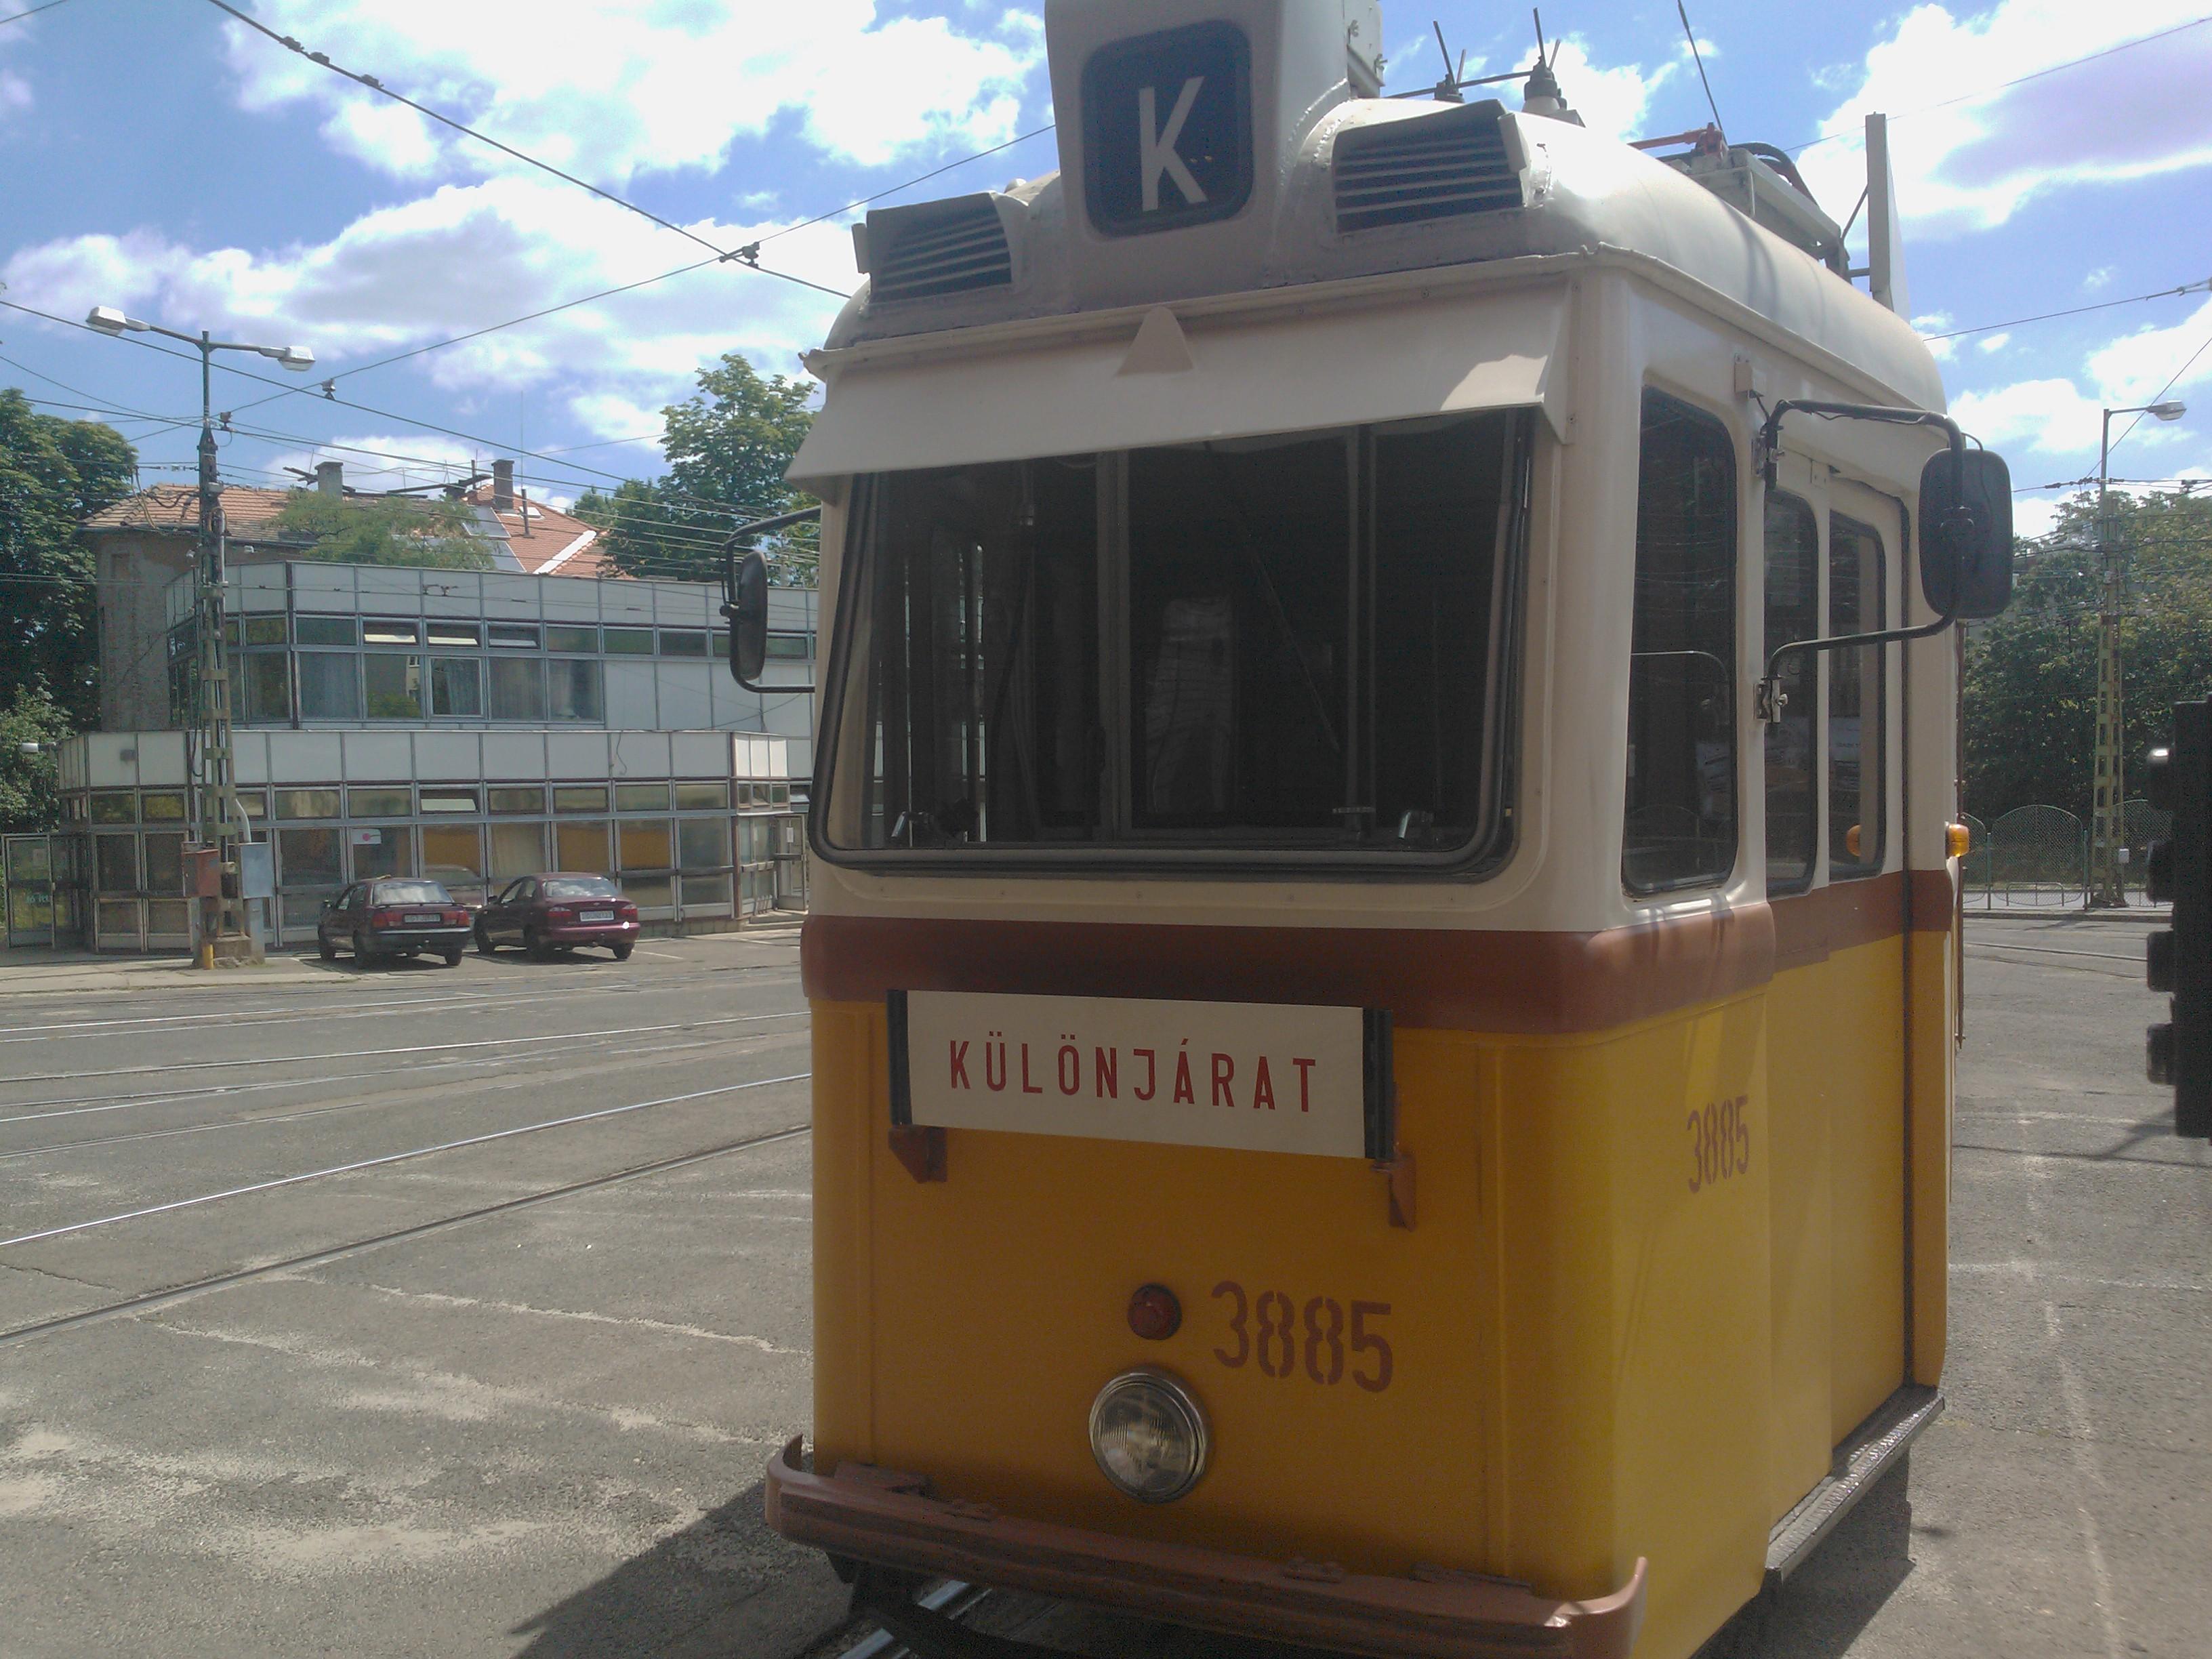 UV_class_heritage_tram_3885_at_Sz%C3%A9pilona%2C_Budapest%2C_2013.jpg